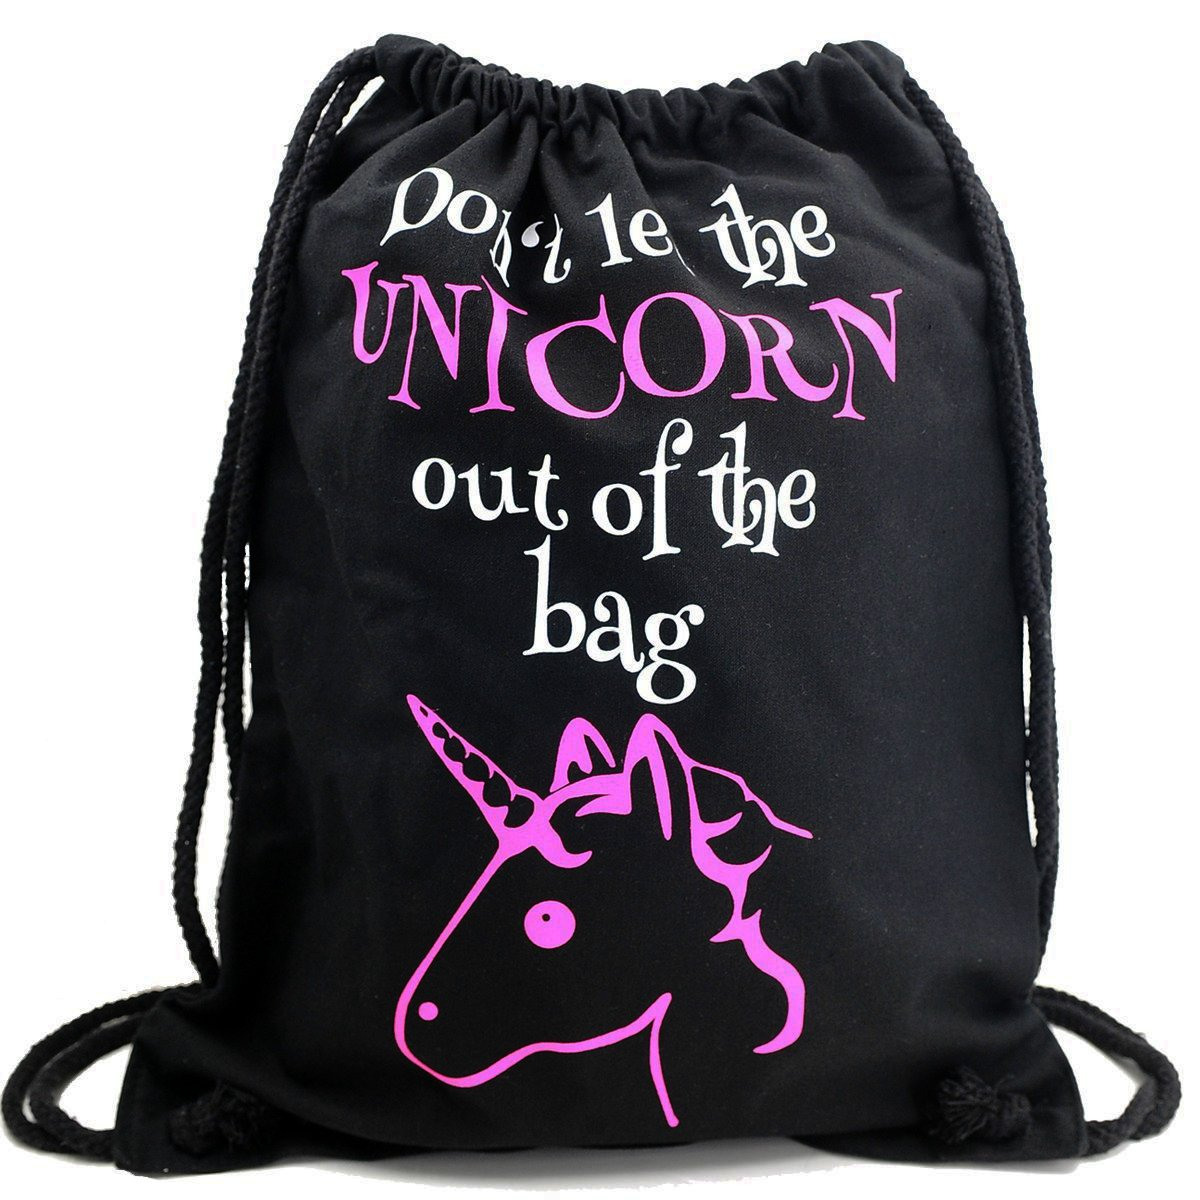 saco con cuerdas mochila unicornio